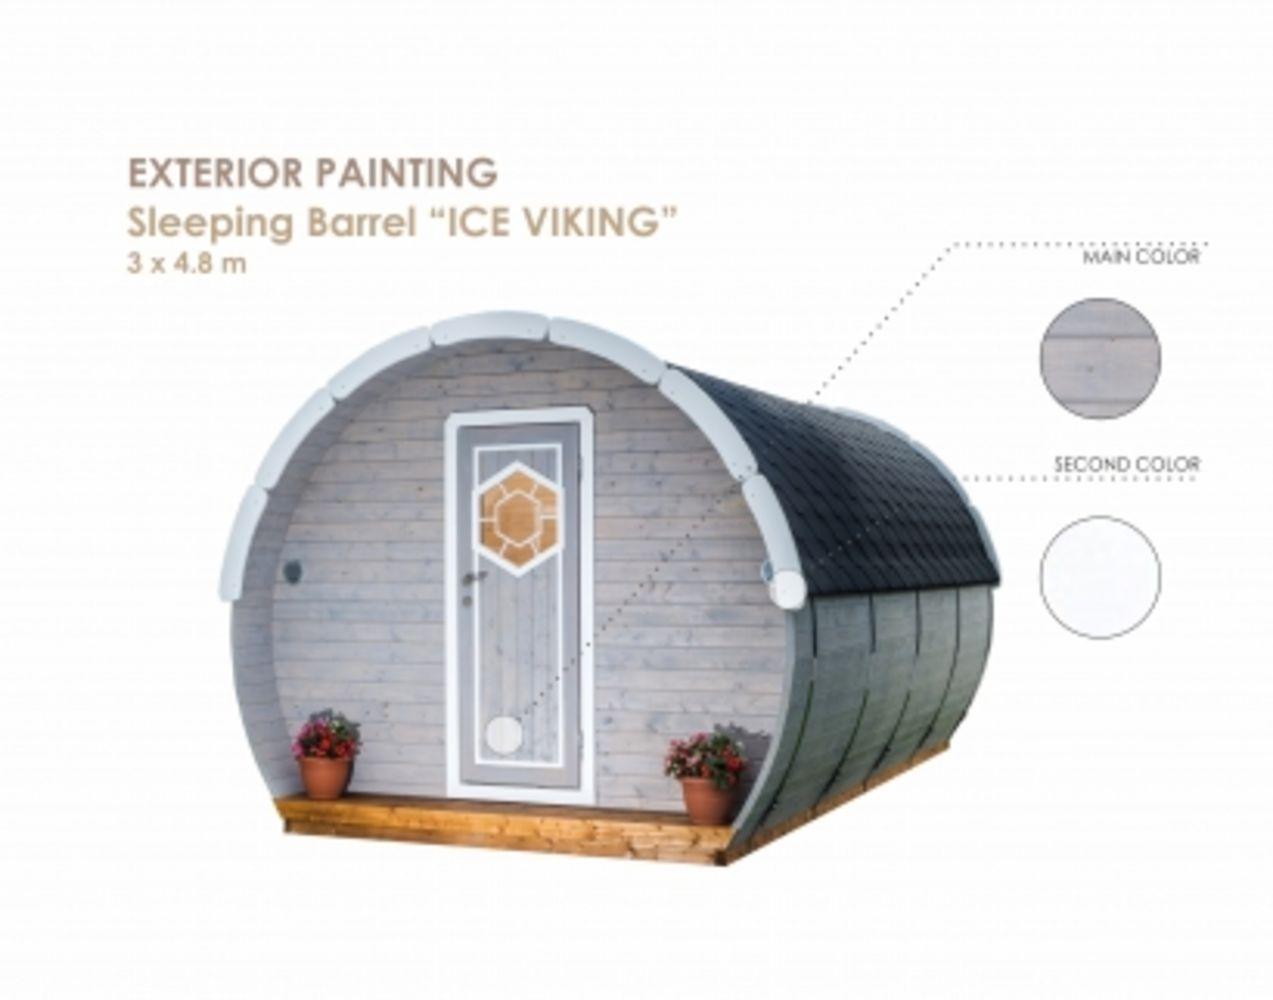 Scandinavian-Style Garden Buildings & More: Upgrade Your Outdoor Space with Cabins, Cubes, Pods, Barrels, Saunas, Hot Tubs & Garden Furniture